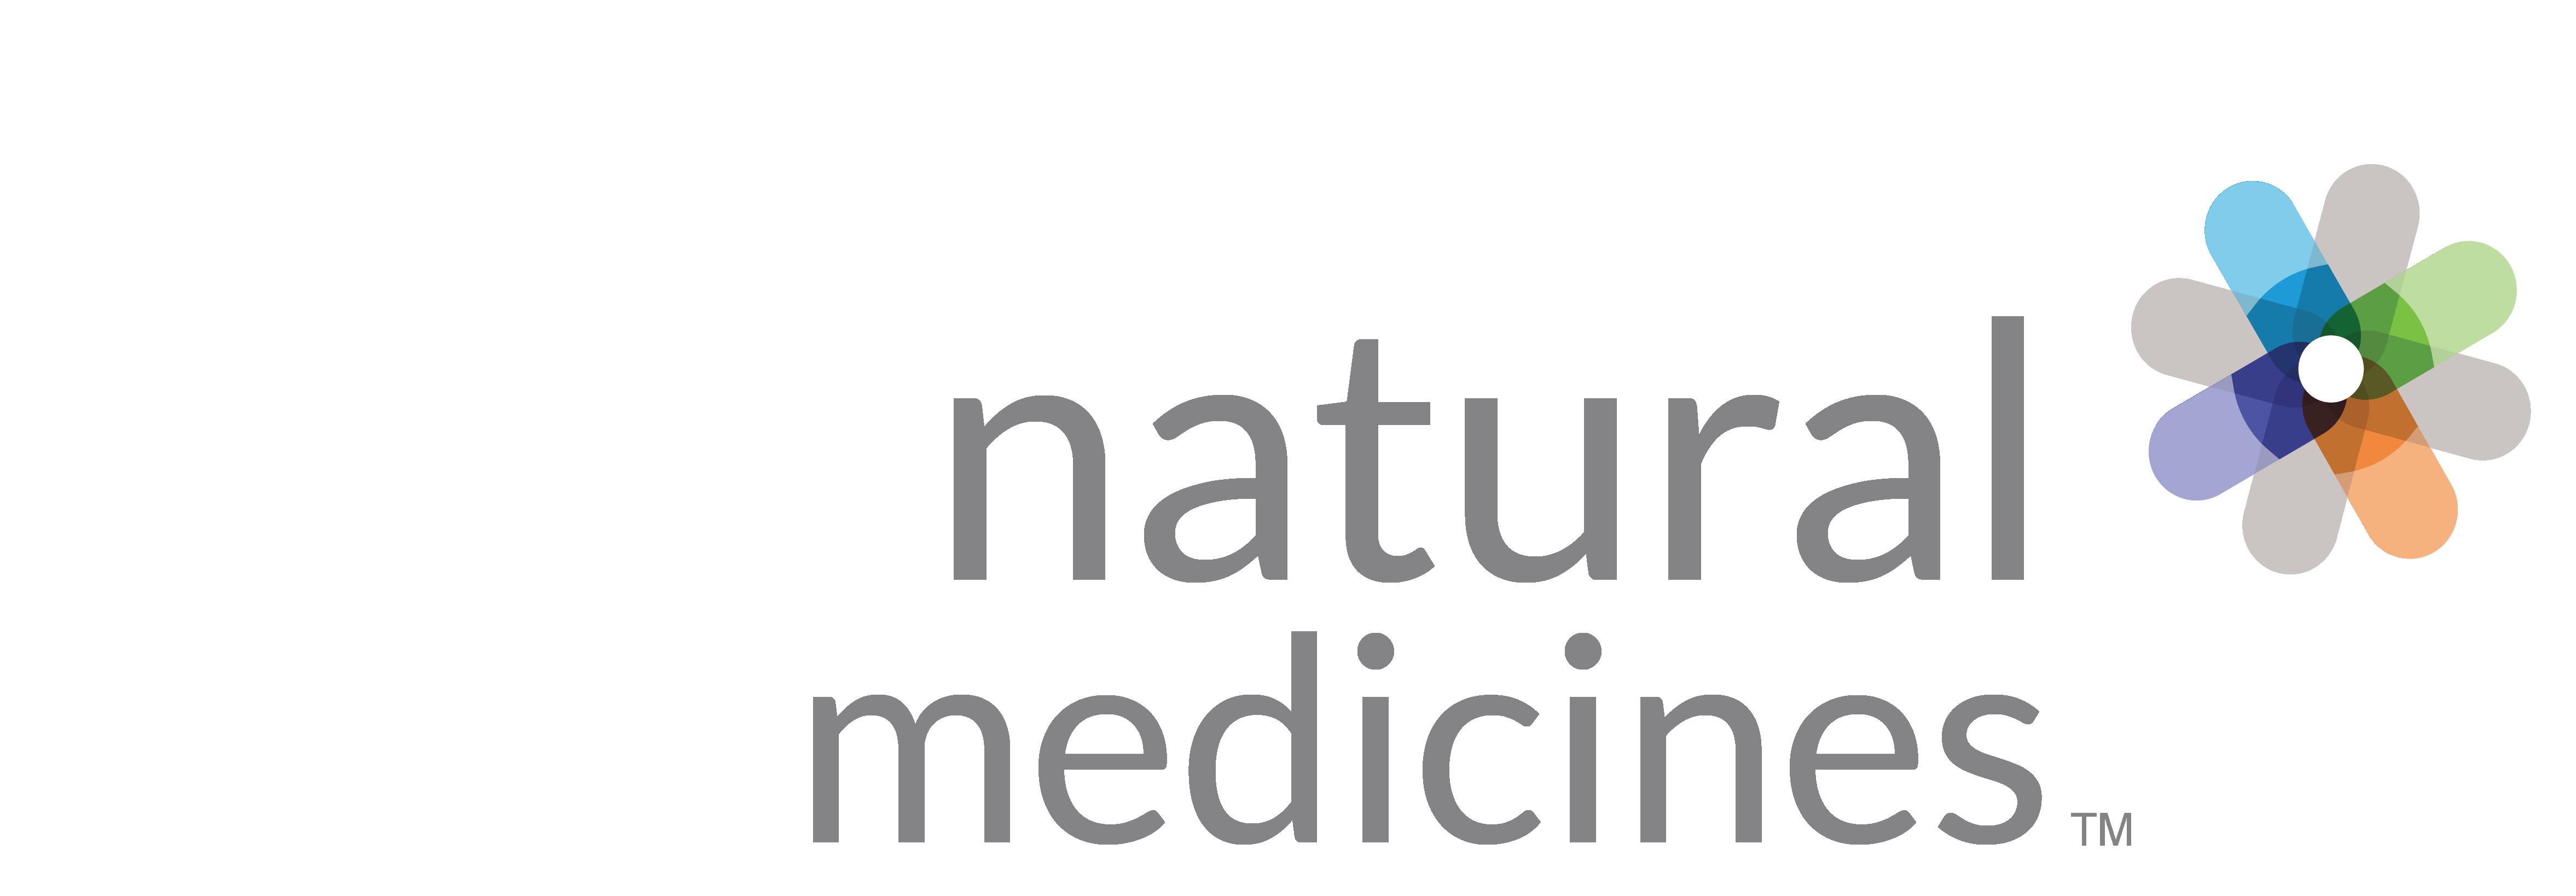 2016_design_-_NM_natural_medicines_-_TM.png